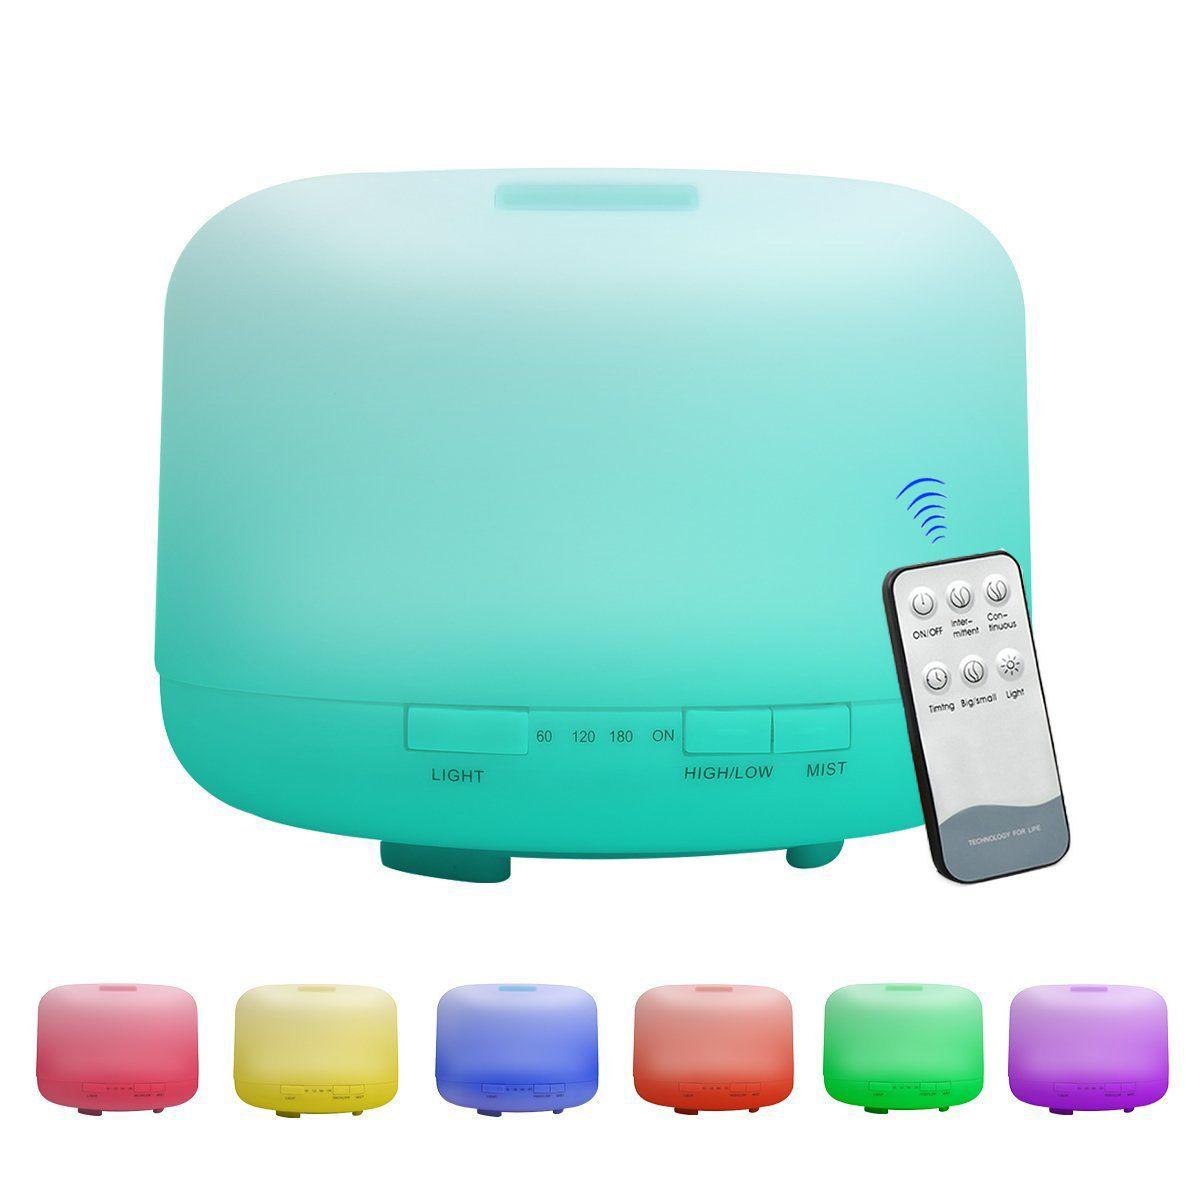 100-240v 500ml Ultrasonic 7 Color Led Timing Air Humidifier Aroma Diffuser Humidifiers